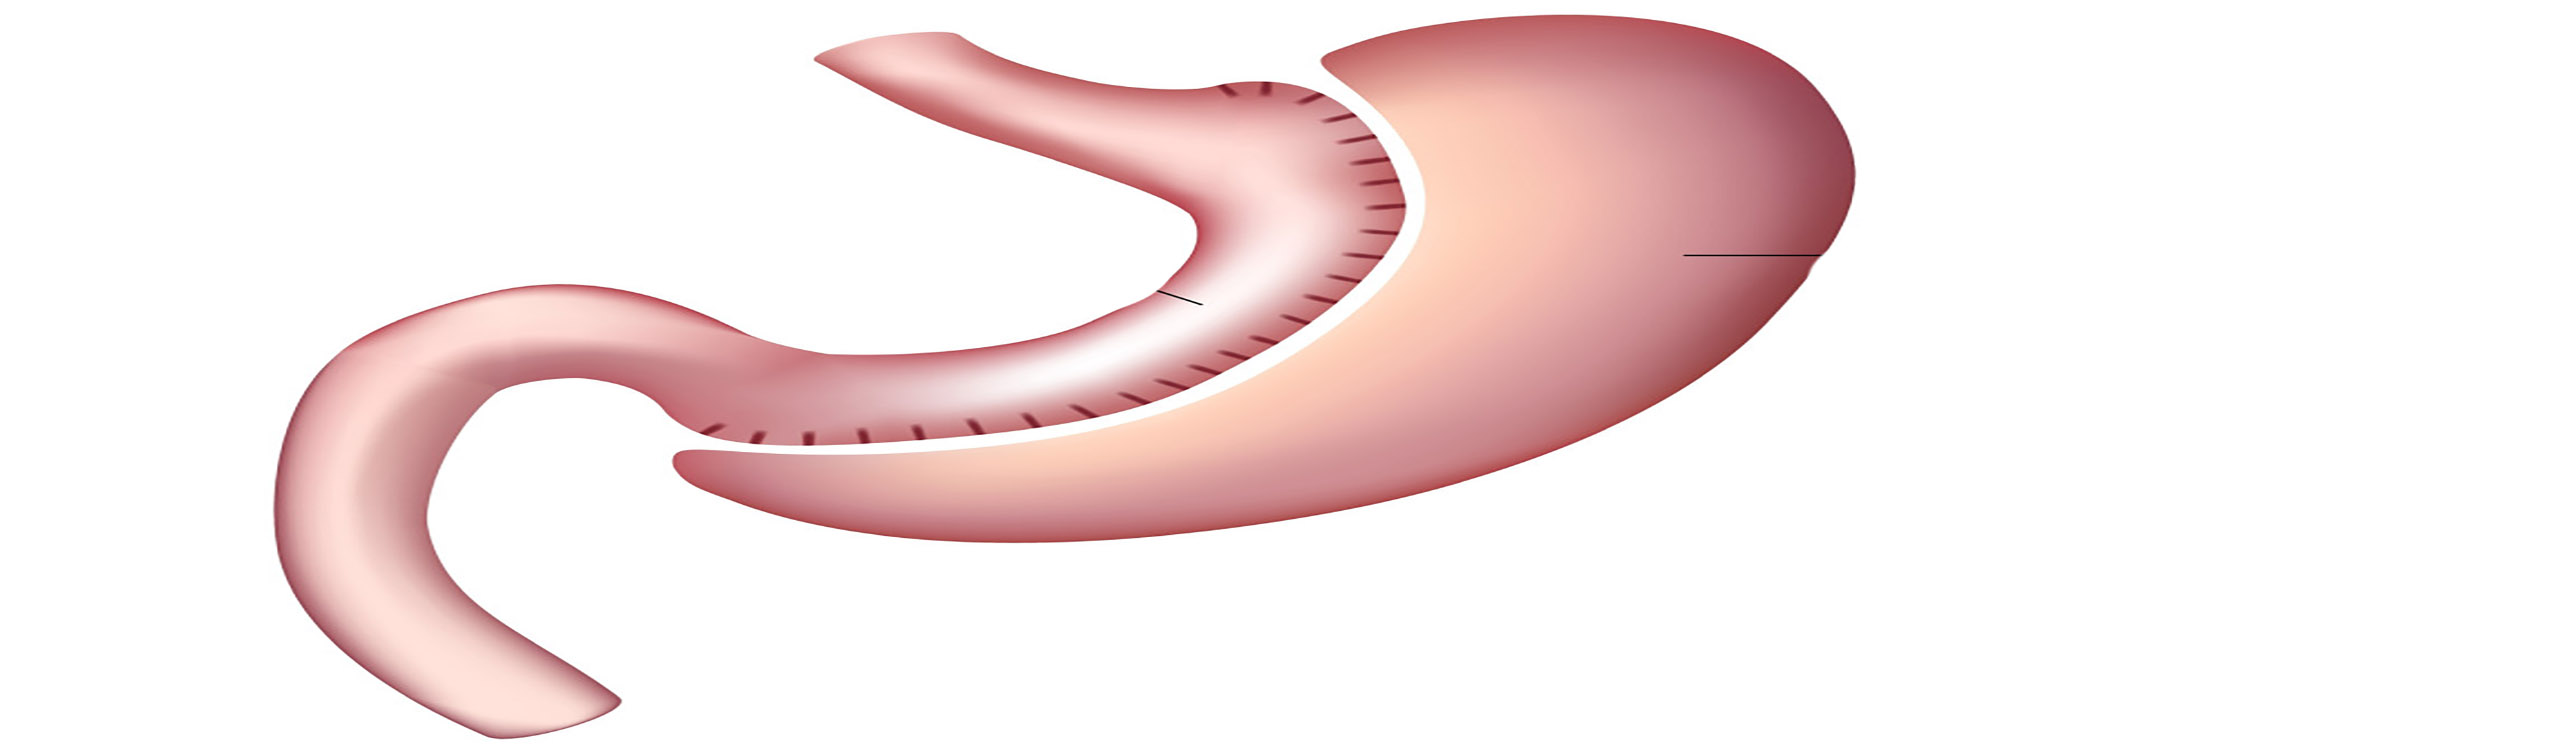 sleeve gastrectomy cost - 2550×750